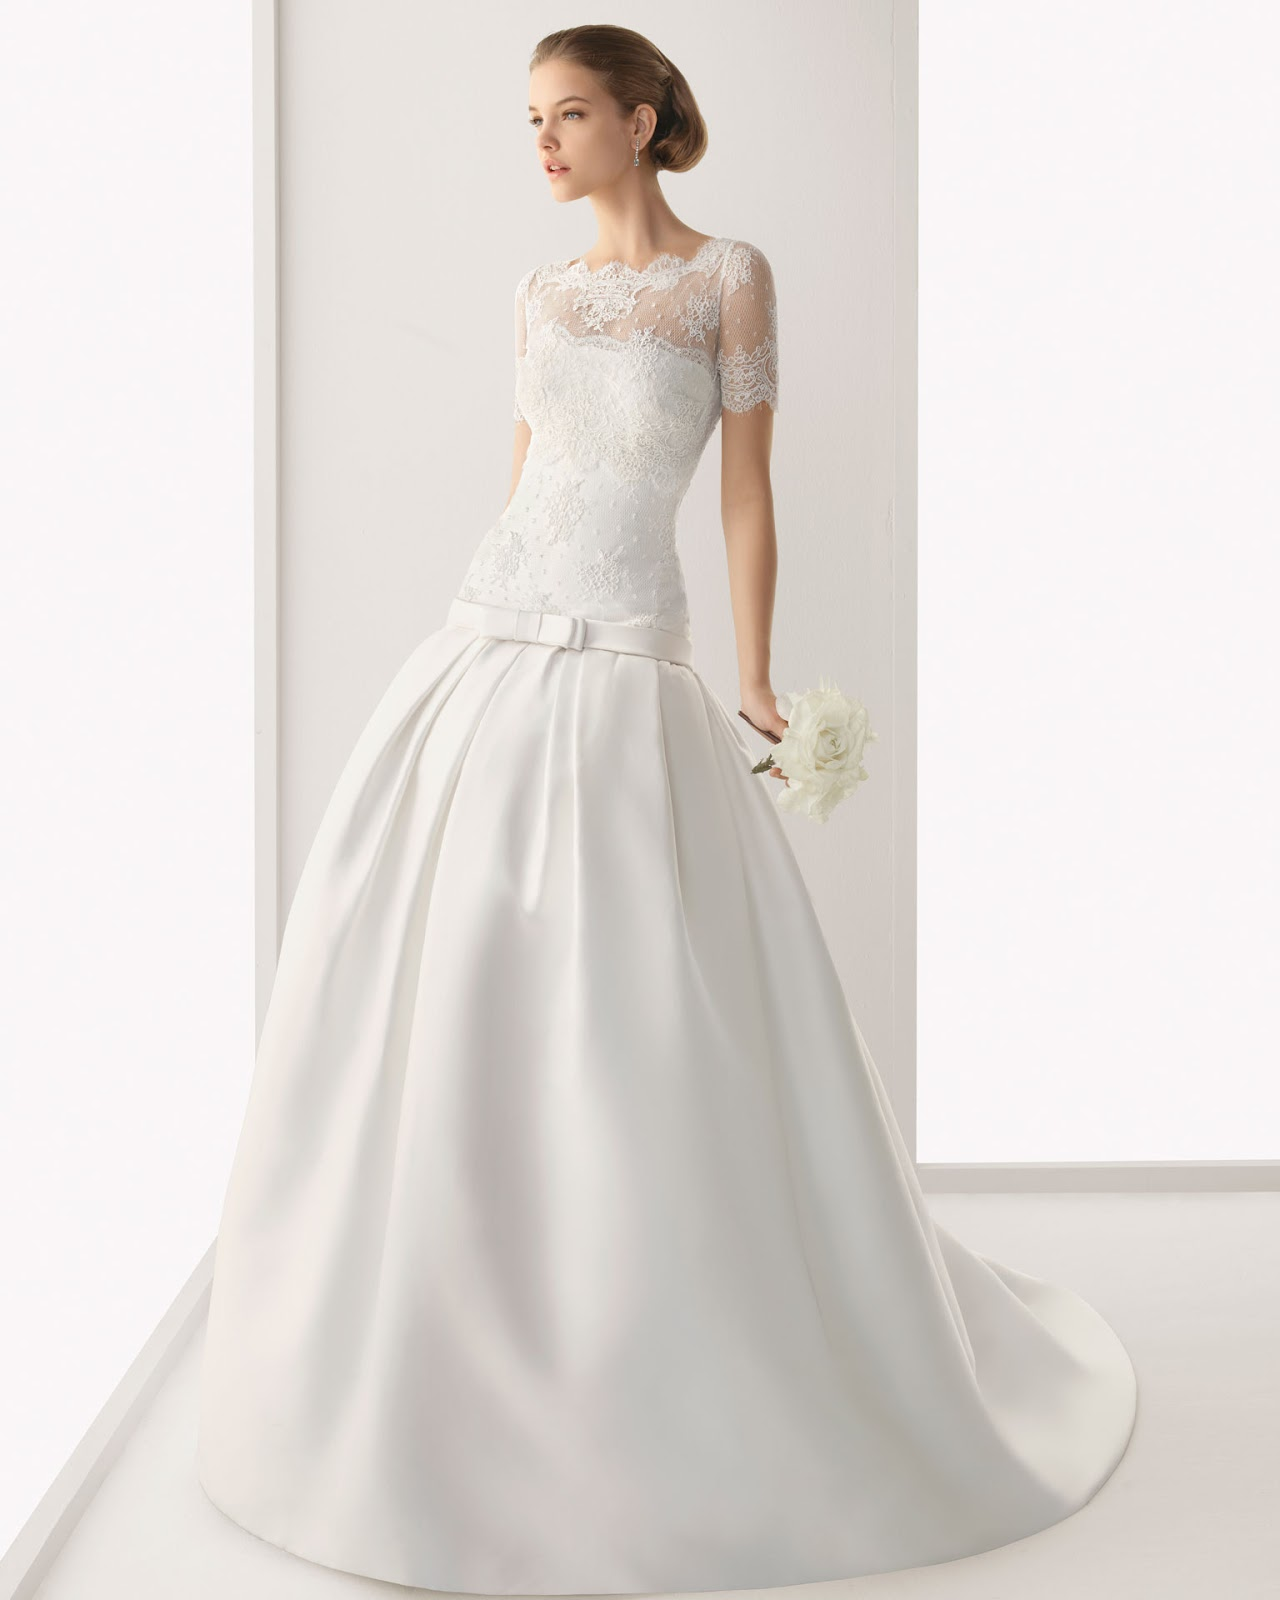 Cheap Wedding Gowns Online Blog Spring 2013 Wedding Dresses From Rosa Clara